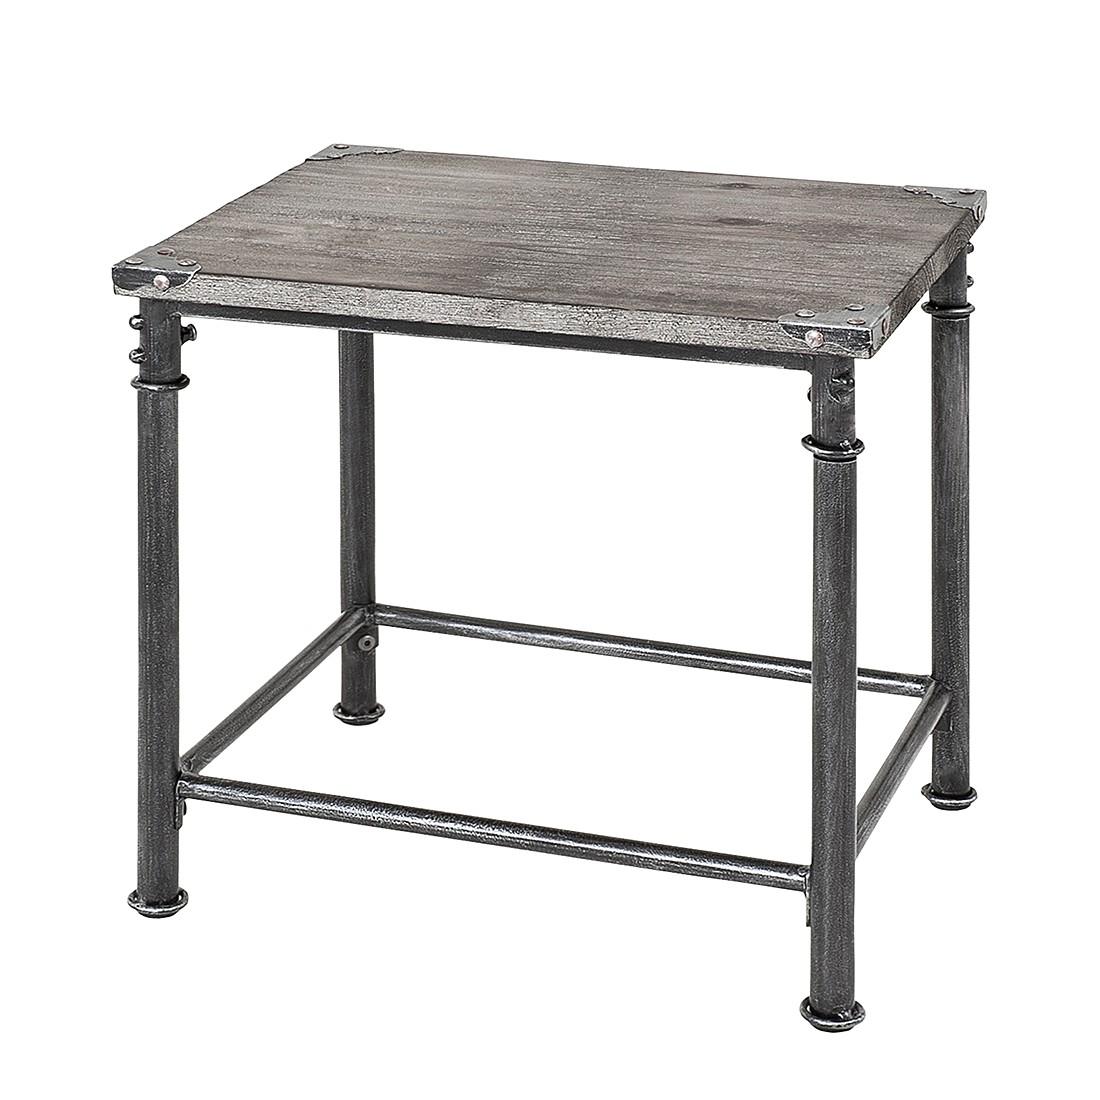 Tischplatte massivholz günstig  Nauhuri.com | Tischplatte Massivholz Günstig ~ Neuesten Design ...